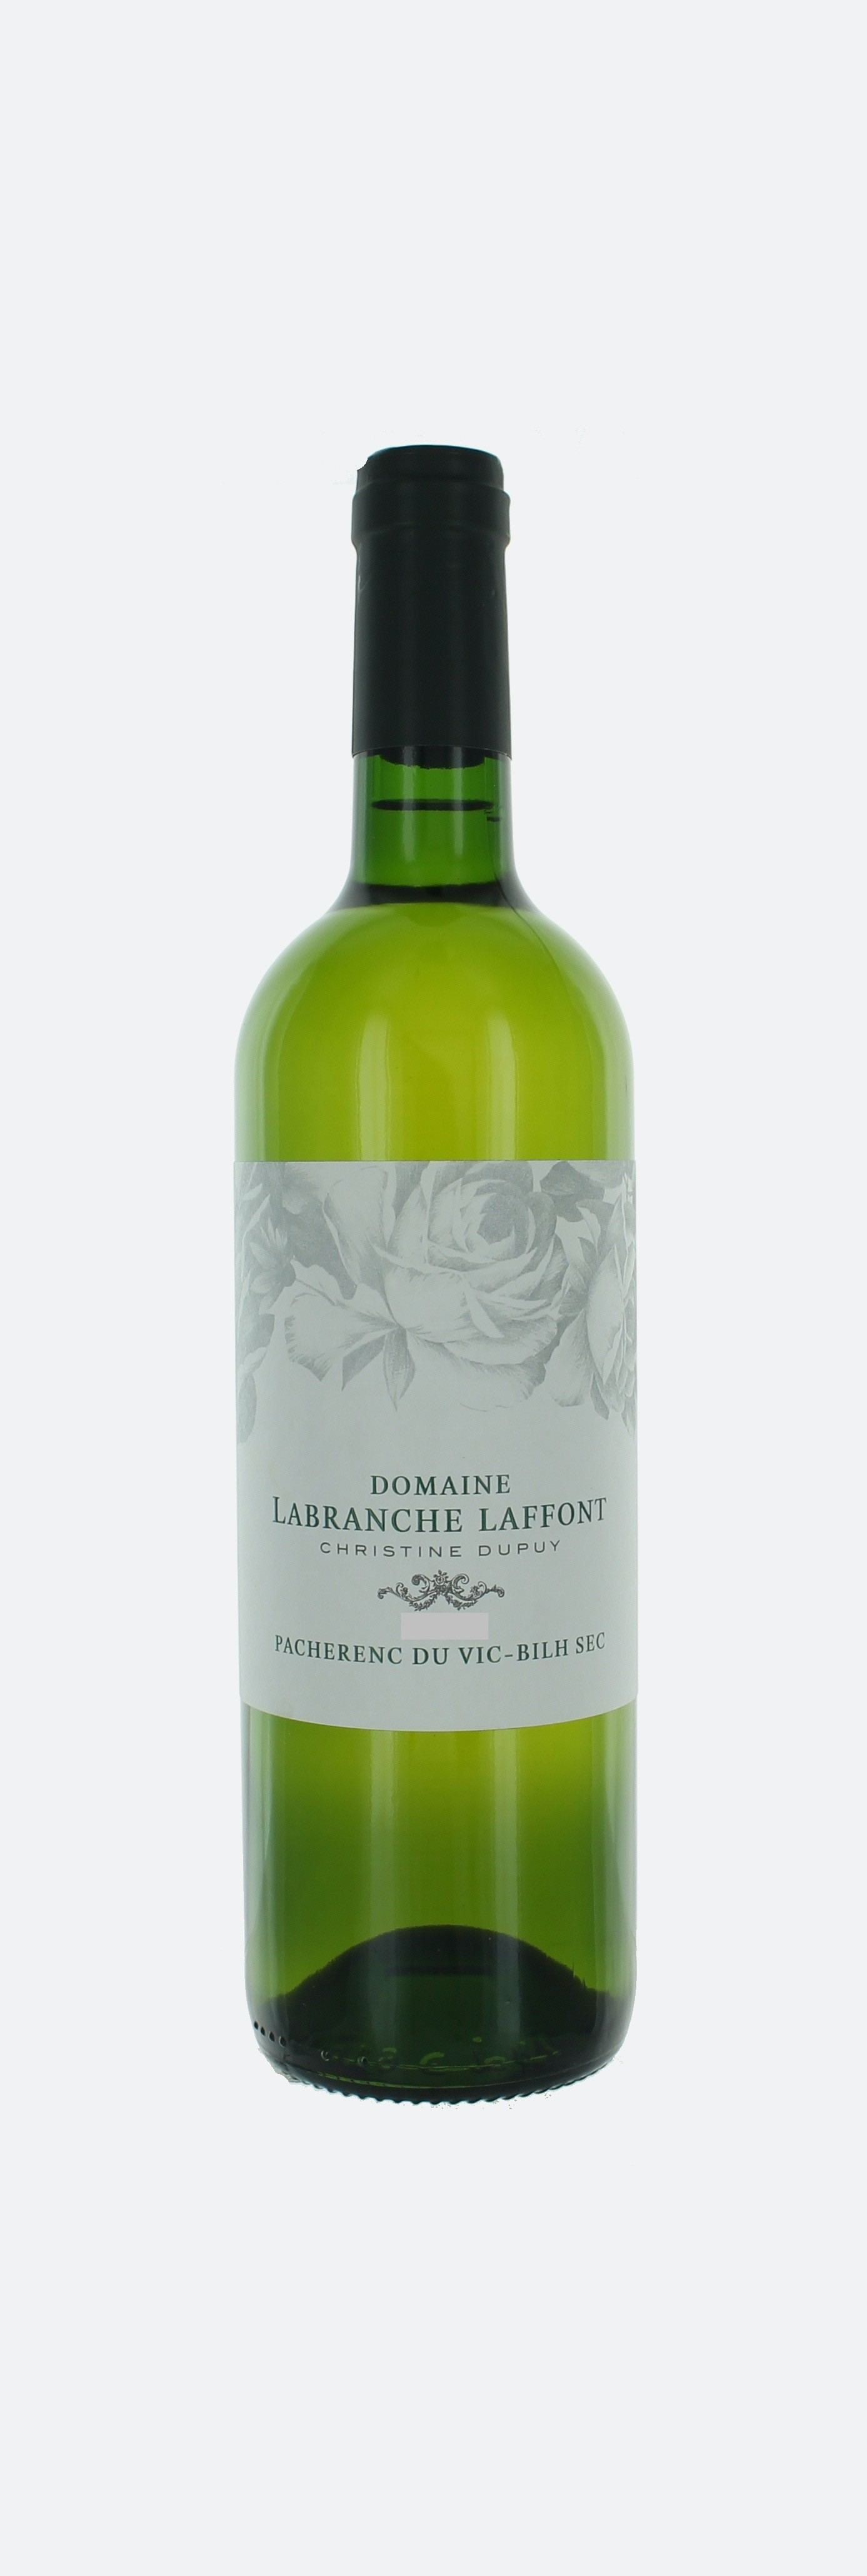 Pacherenc SEC, Labranche Laffont